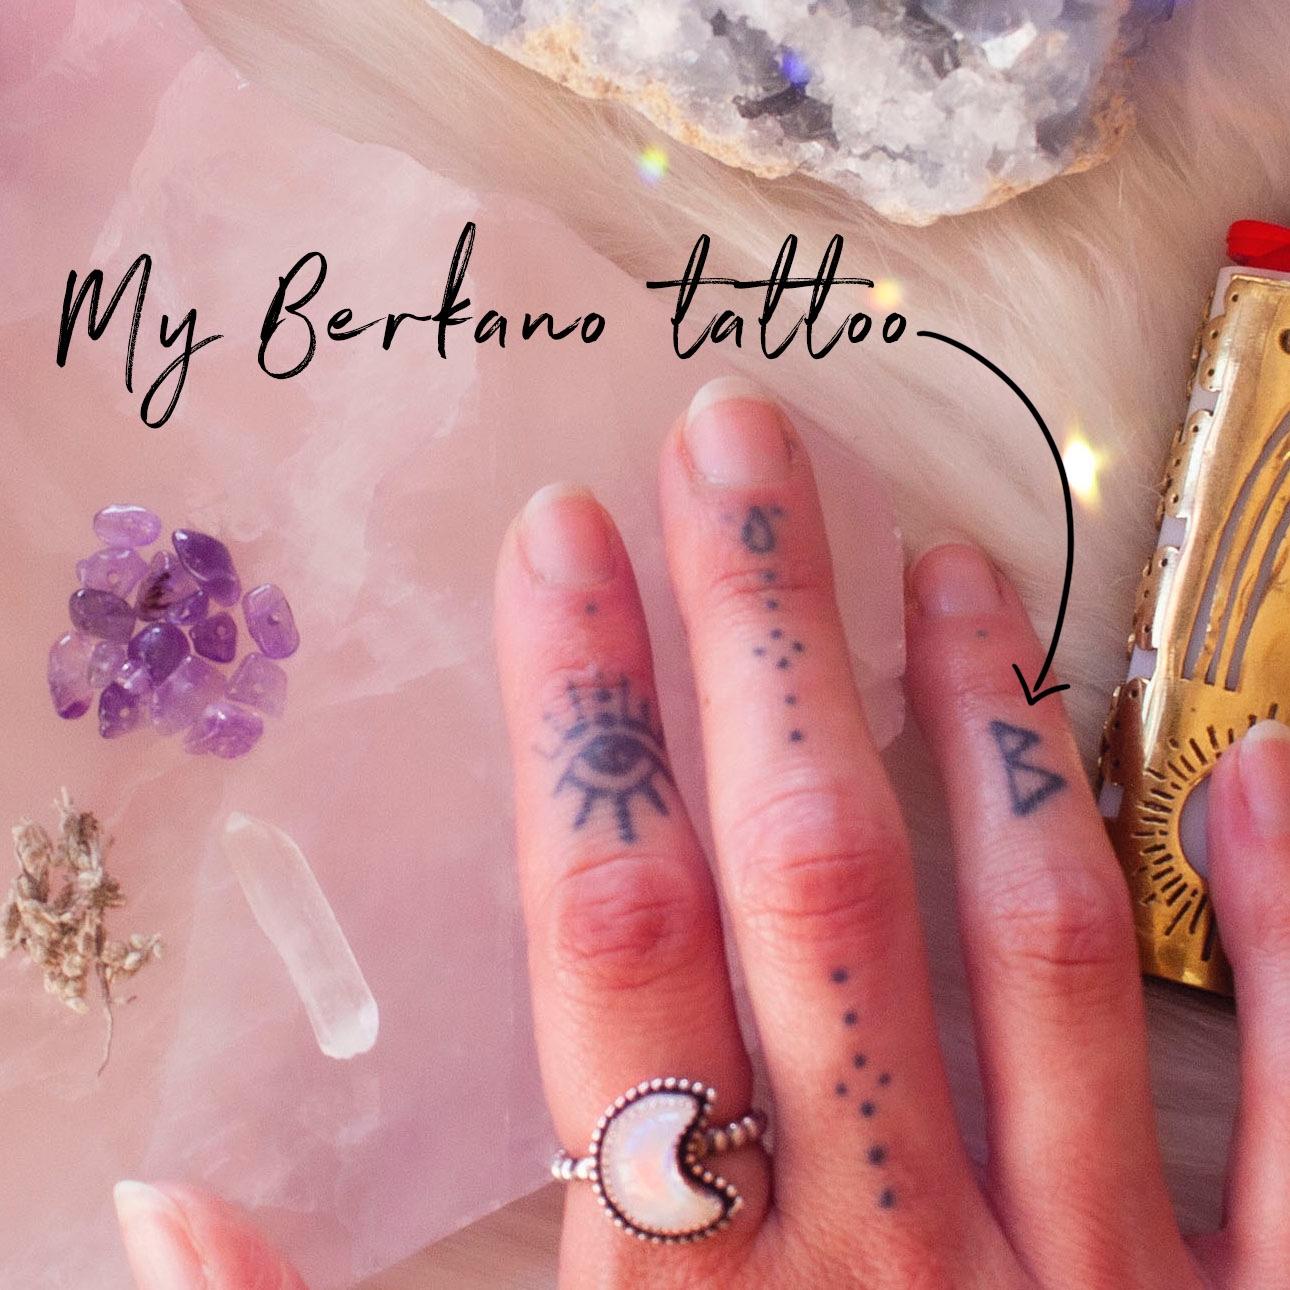 berkano-tattoo-for-motherhood